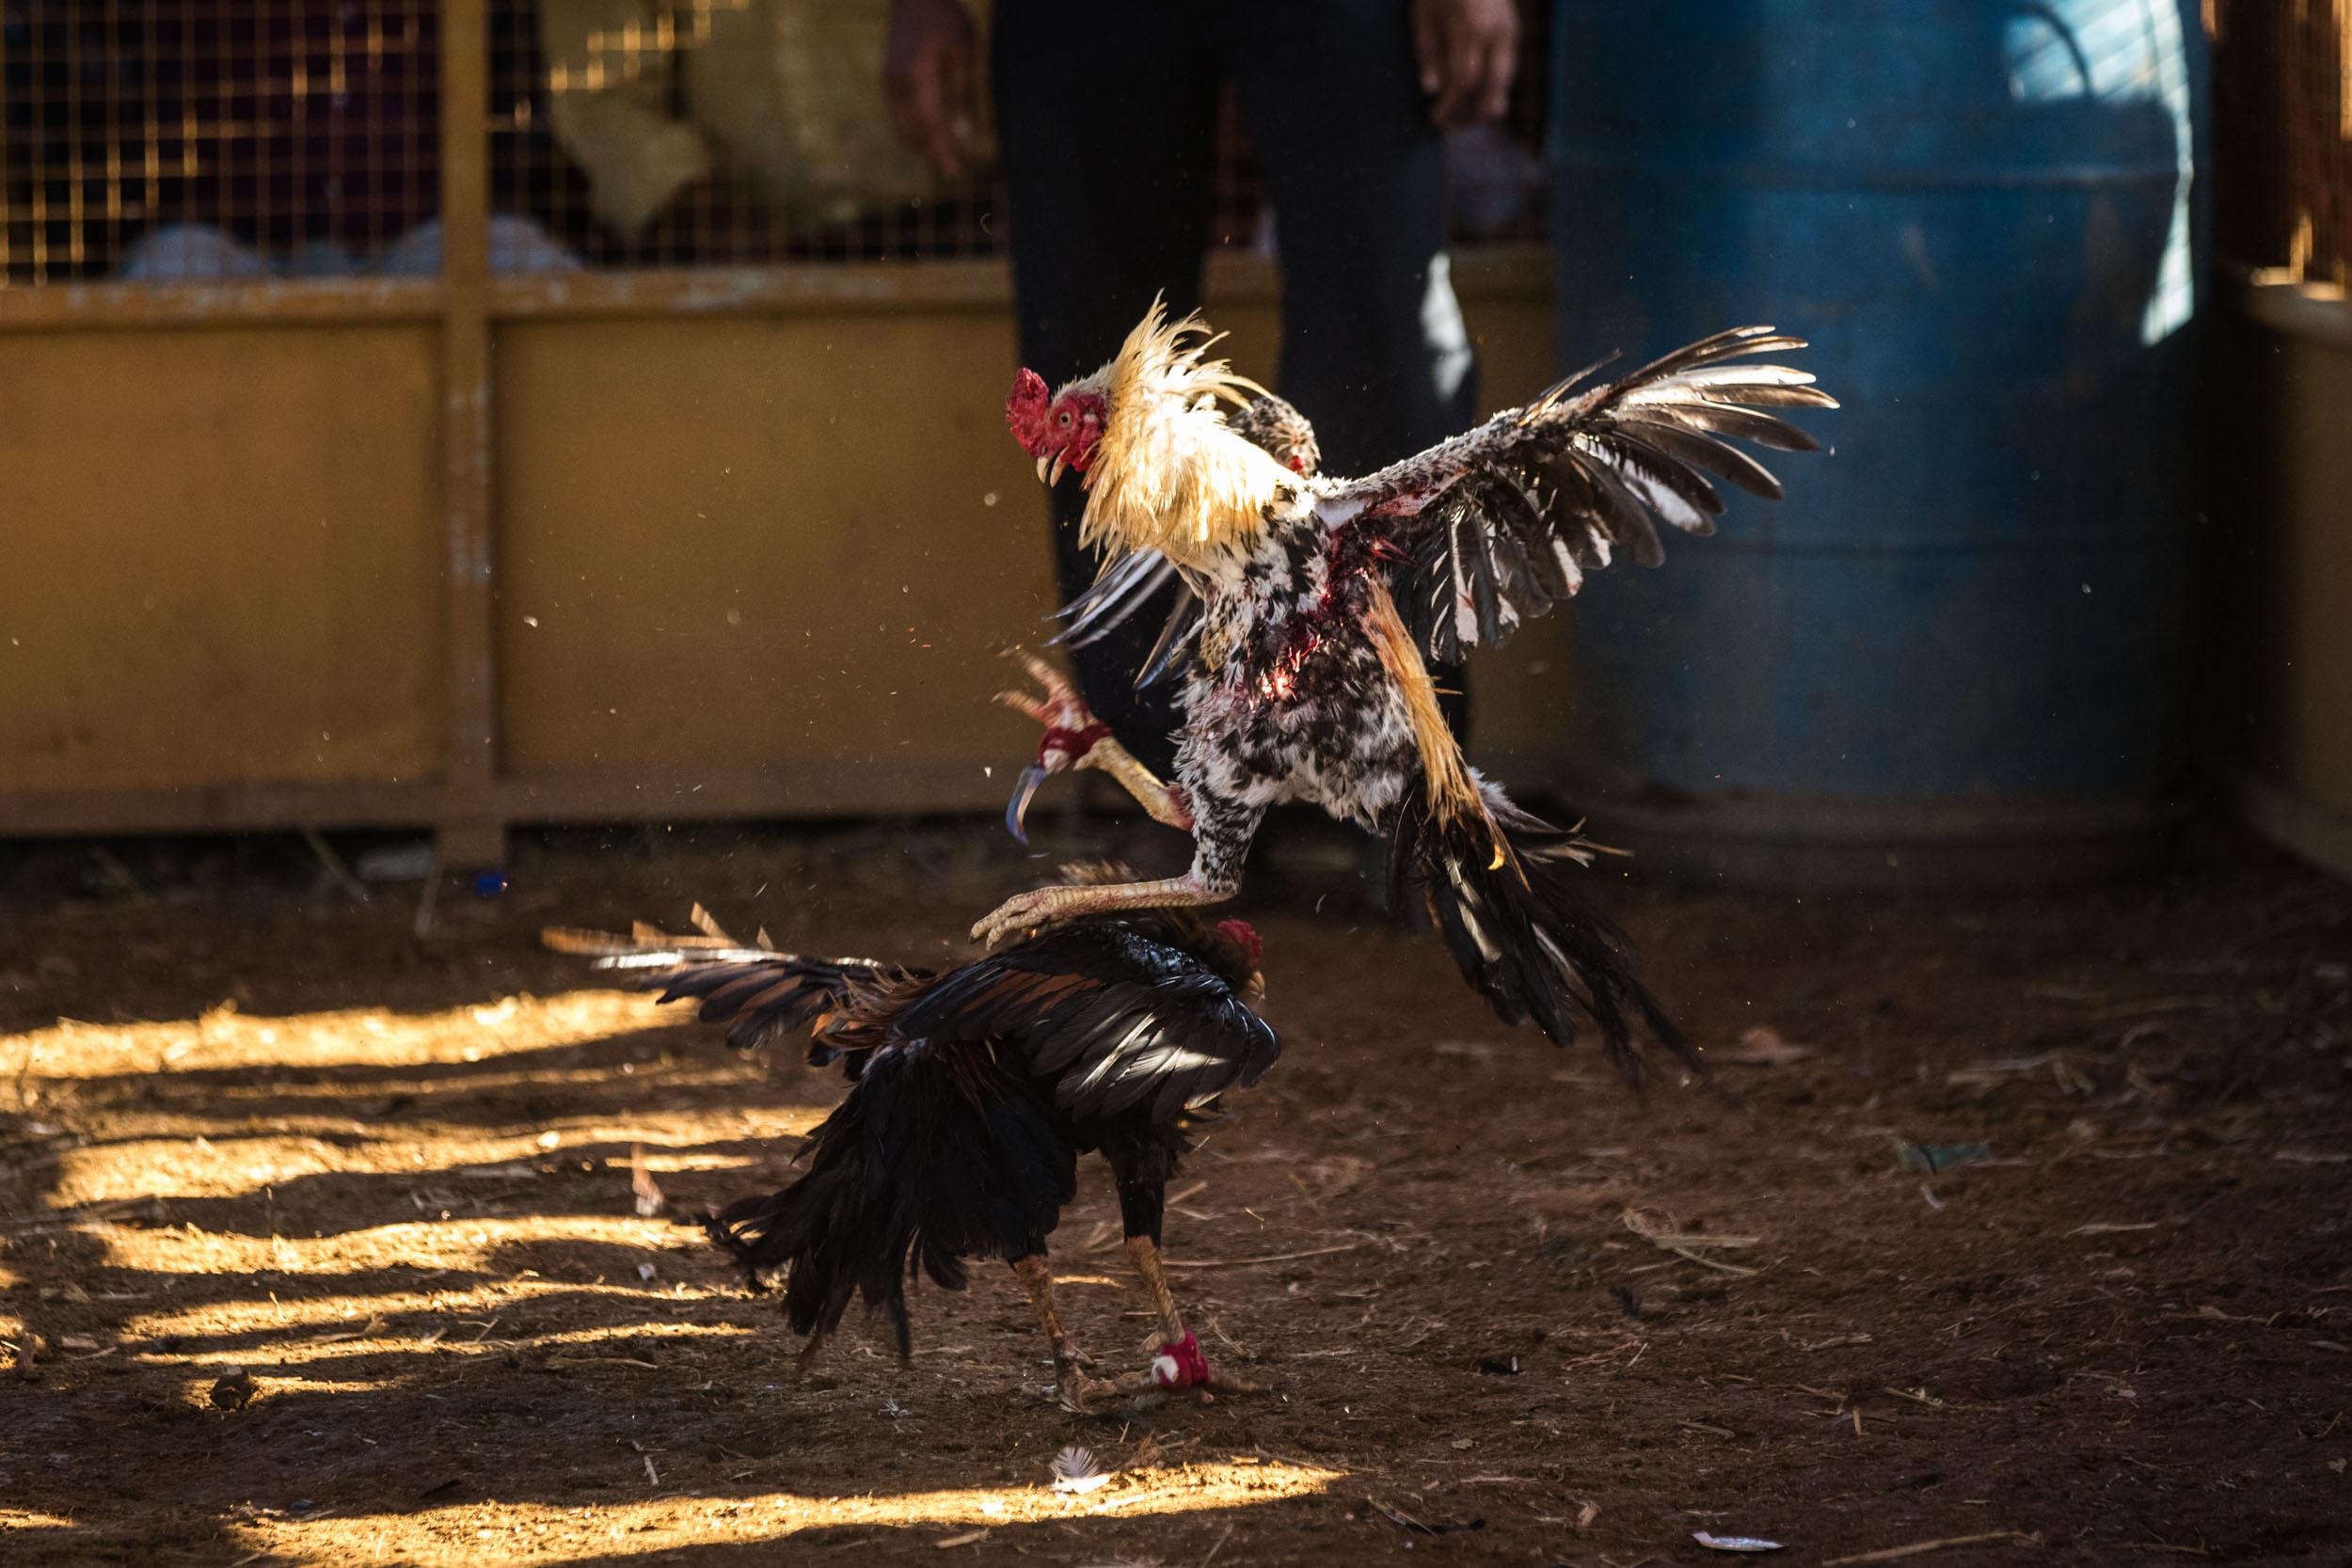 Giuliano_Berti_Chicken-Fight_India-9.jpg